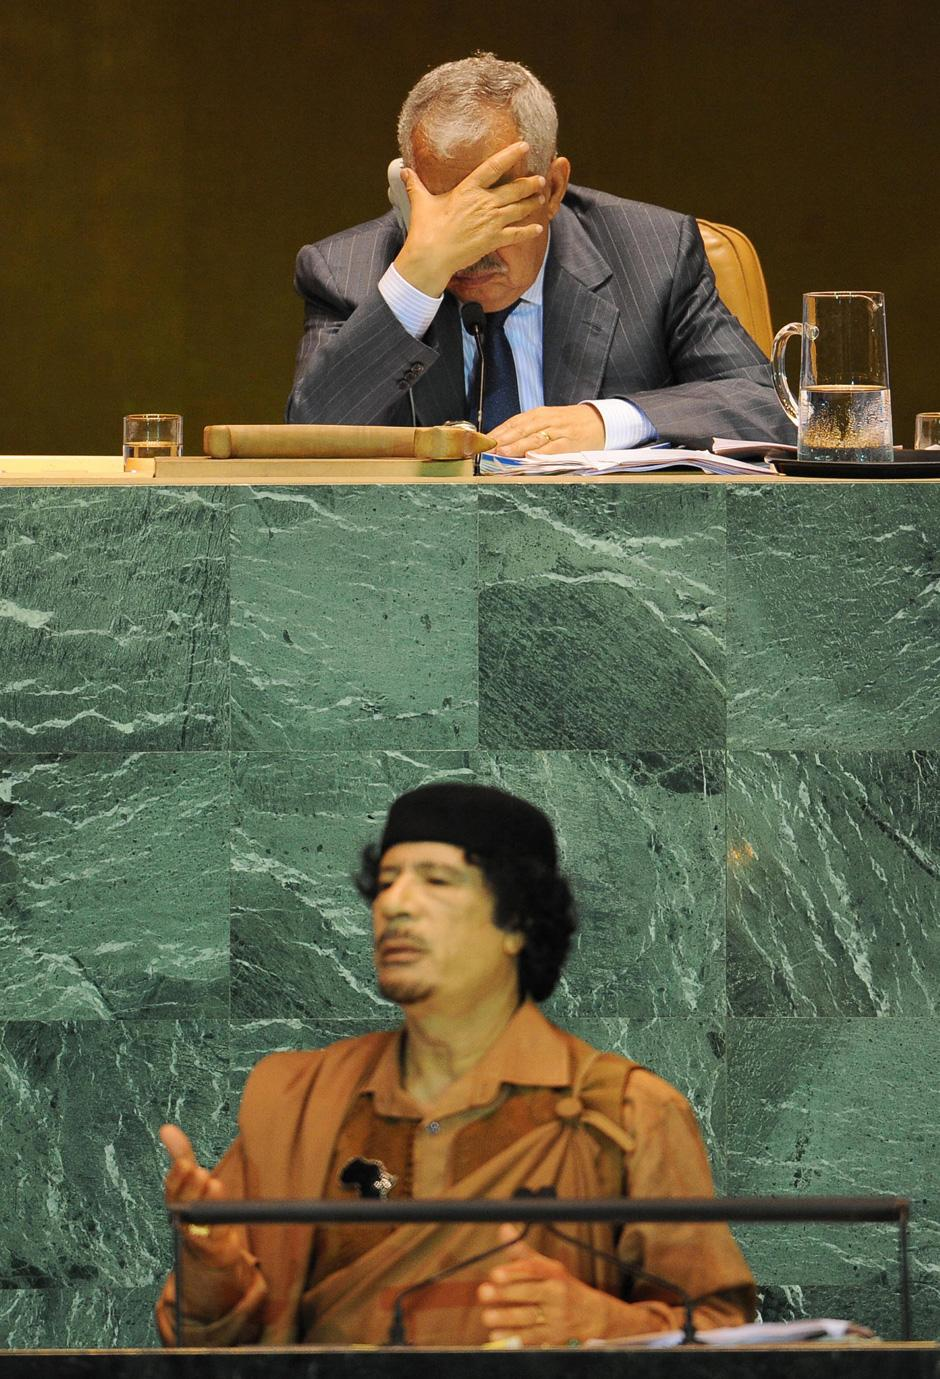 gadhafi-ay-un-with-man-over-him.jpg